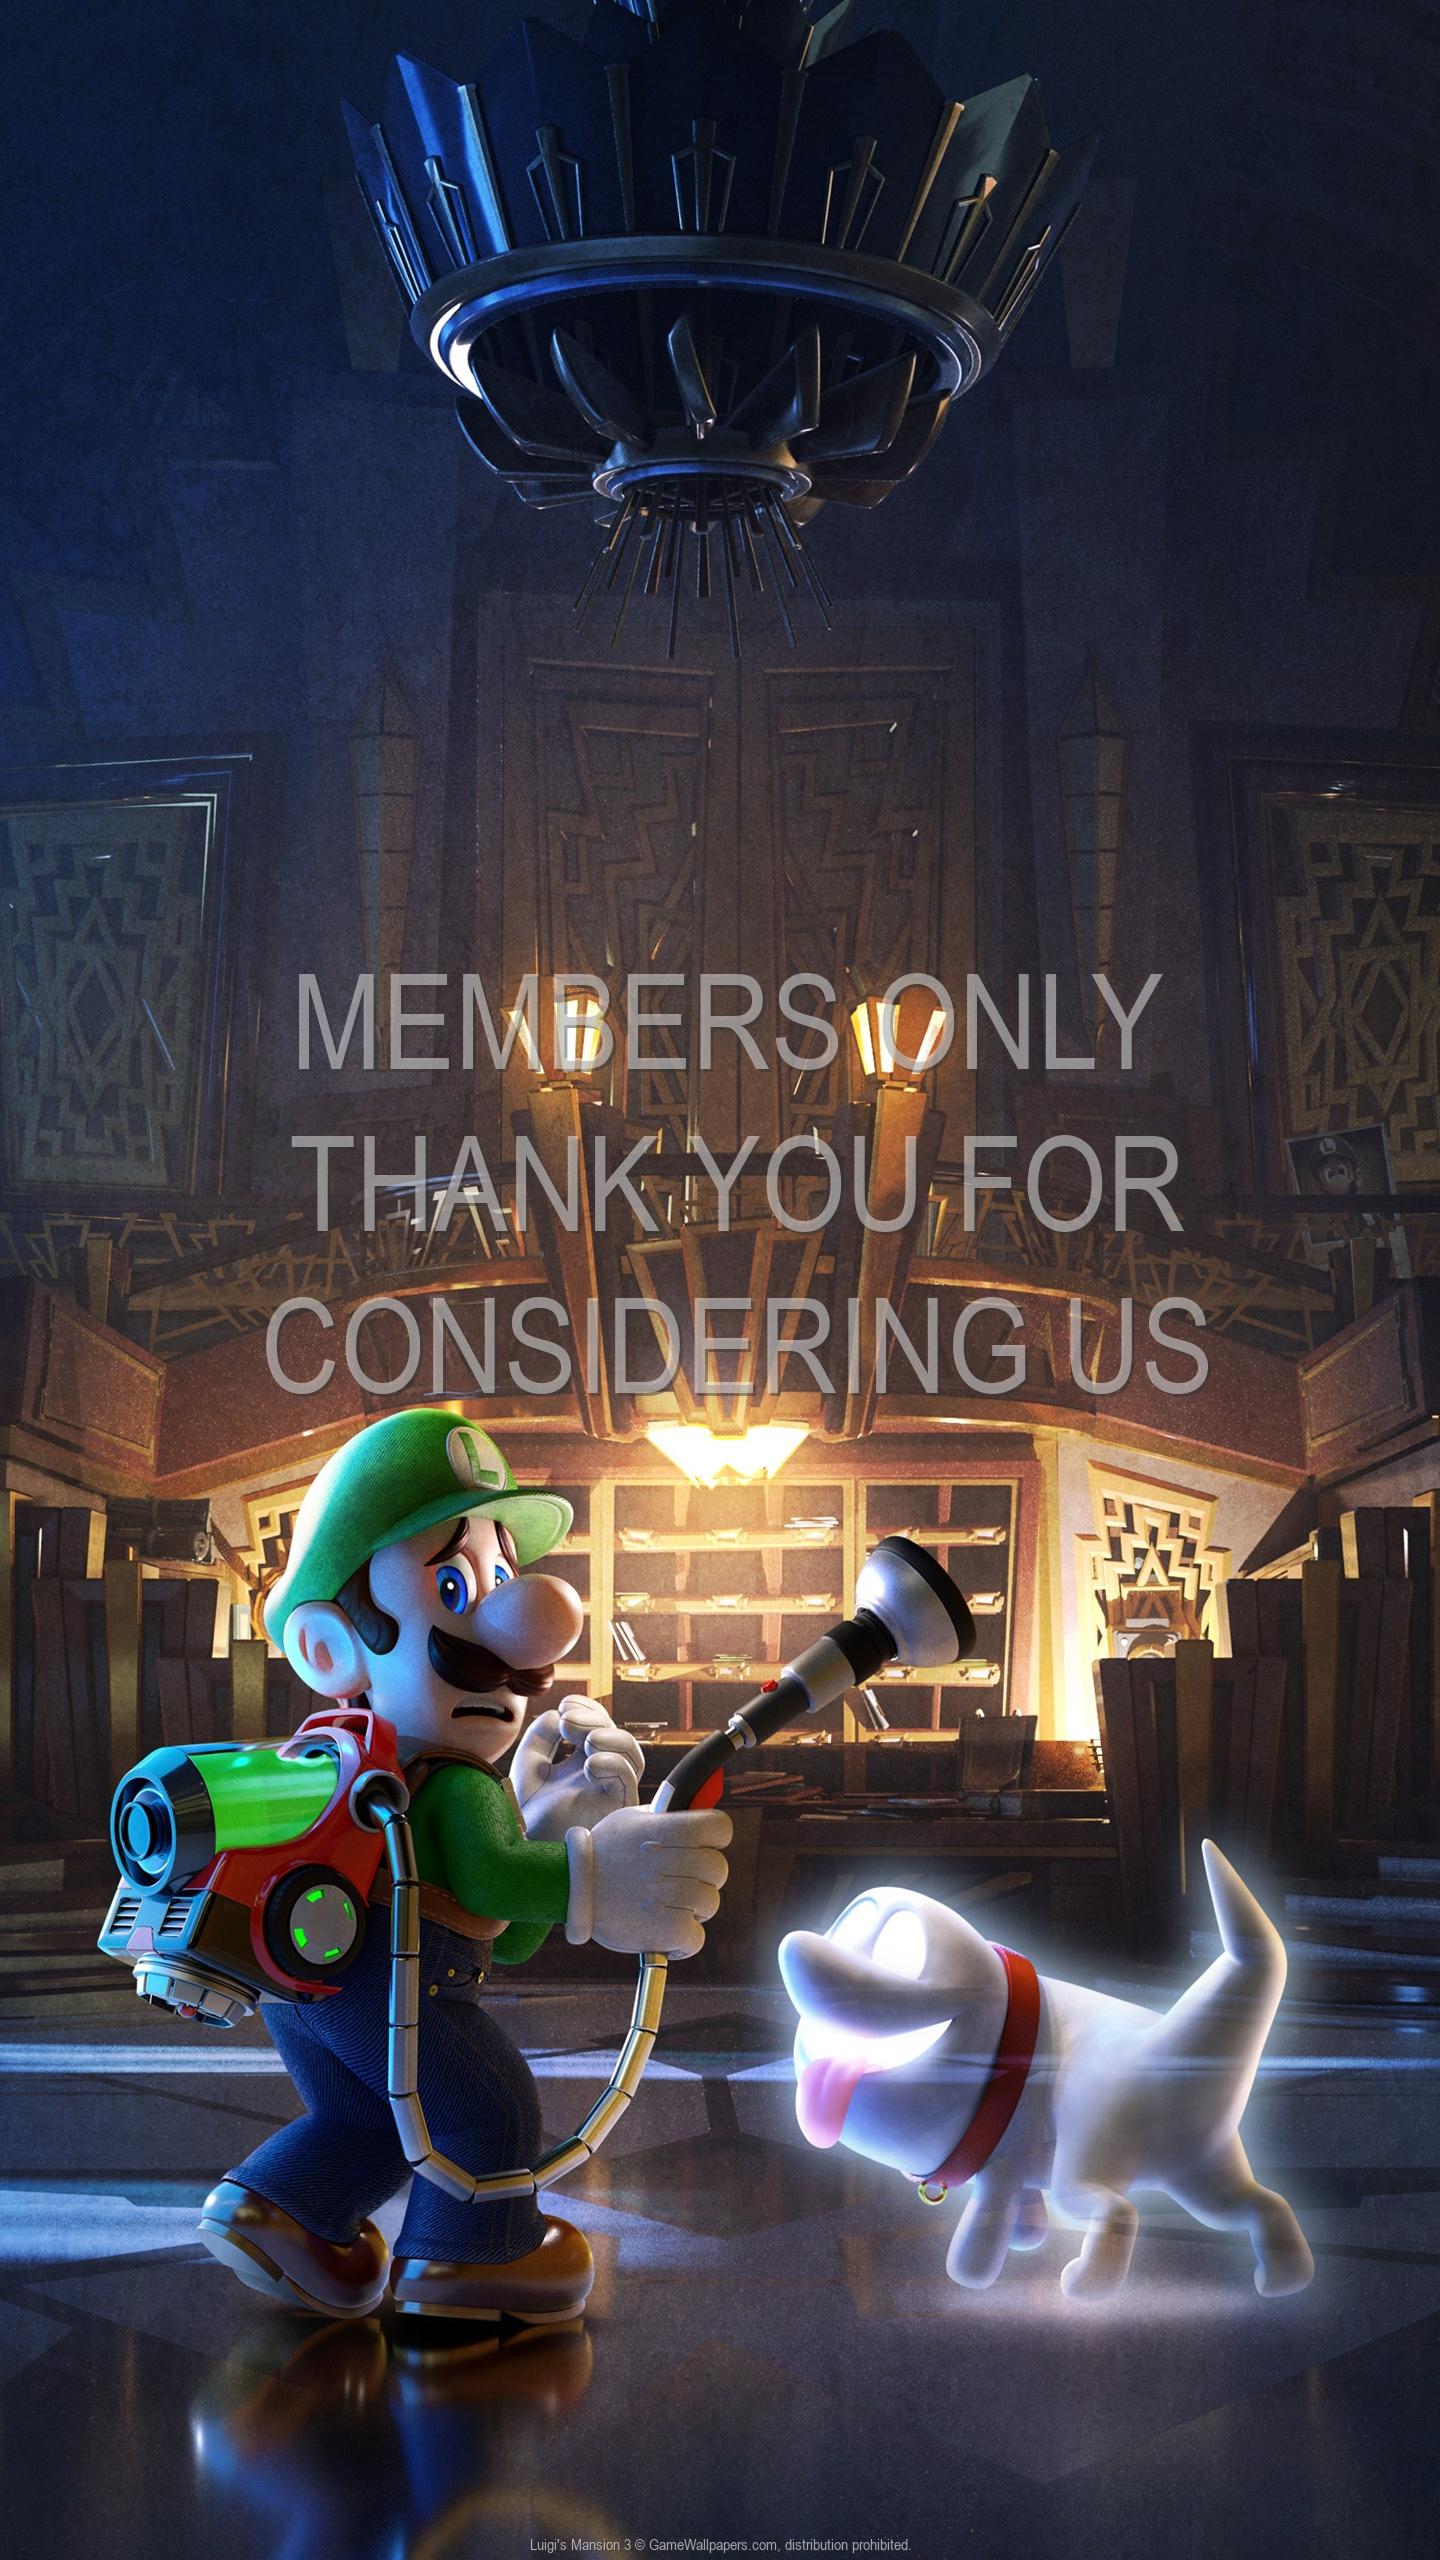 Luigi's Mansion 3 1920x1080 Mobile wallpaper or background 02